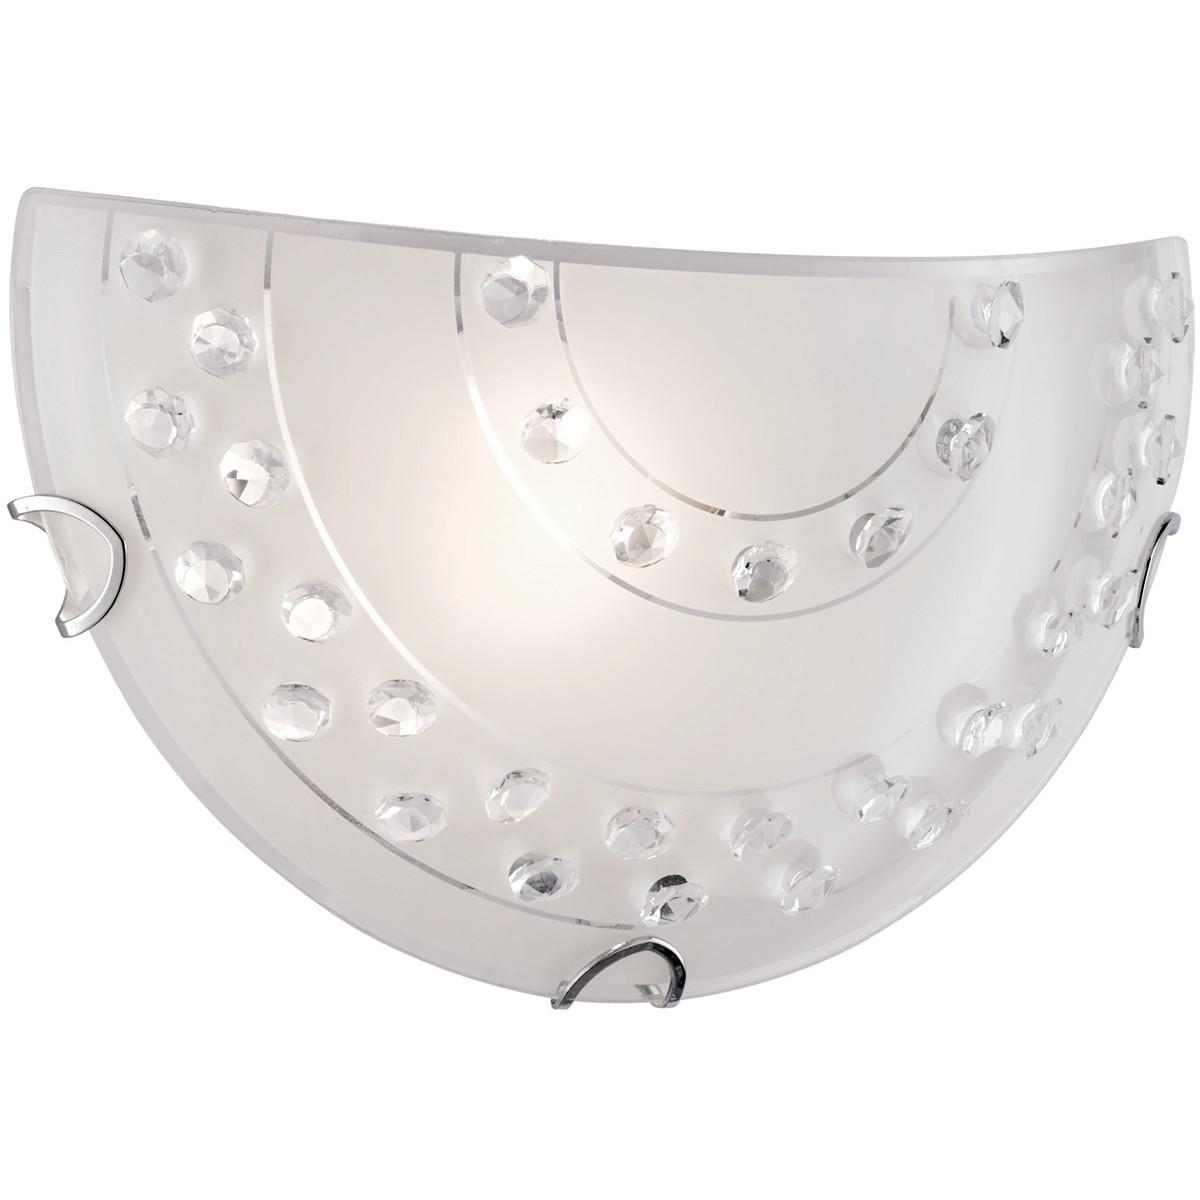 LED Wandlamp - Wandverlichting - Trion Crasto - E27 Fitting - Rond - Mat Wit - Aluminium